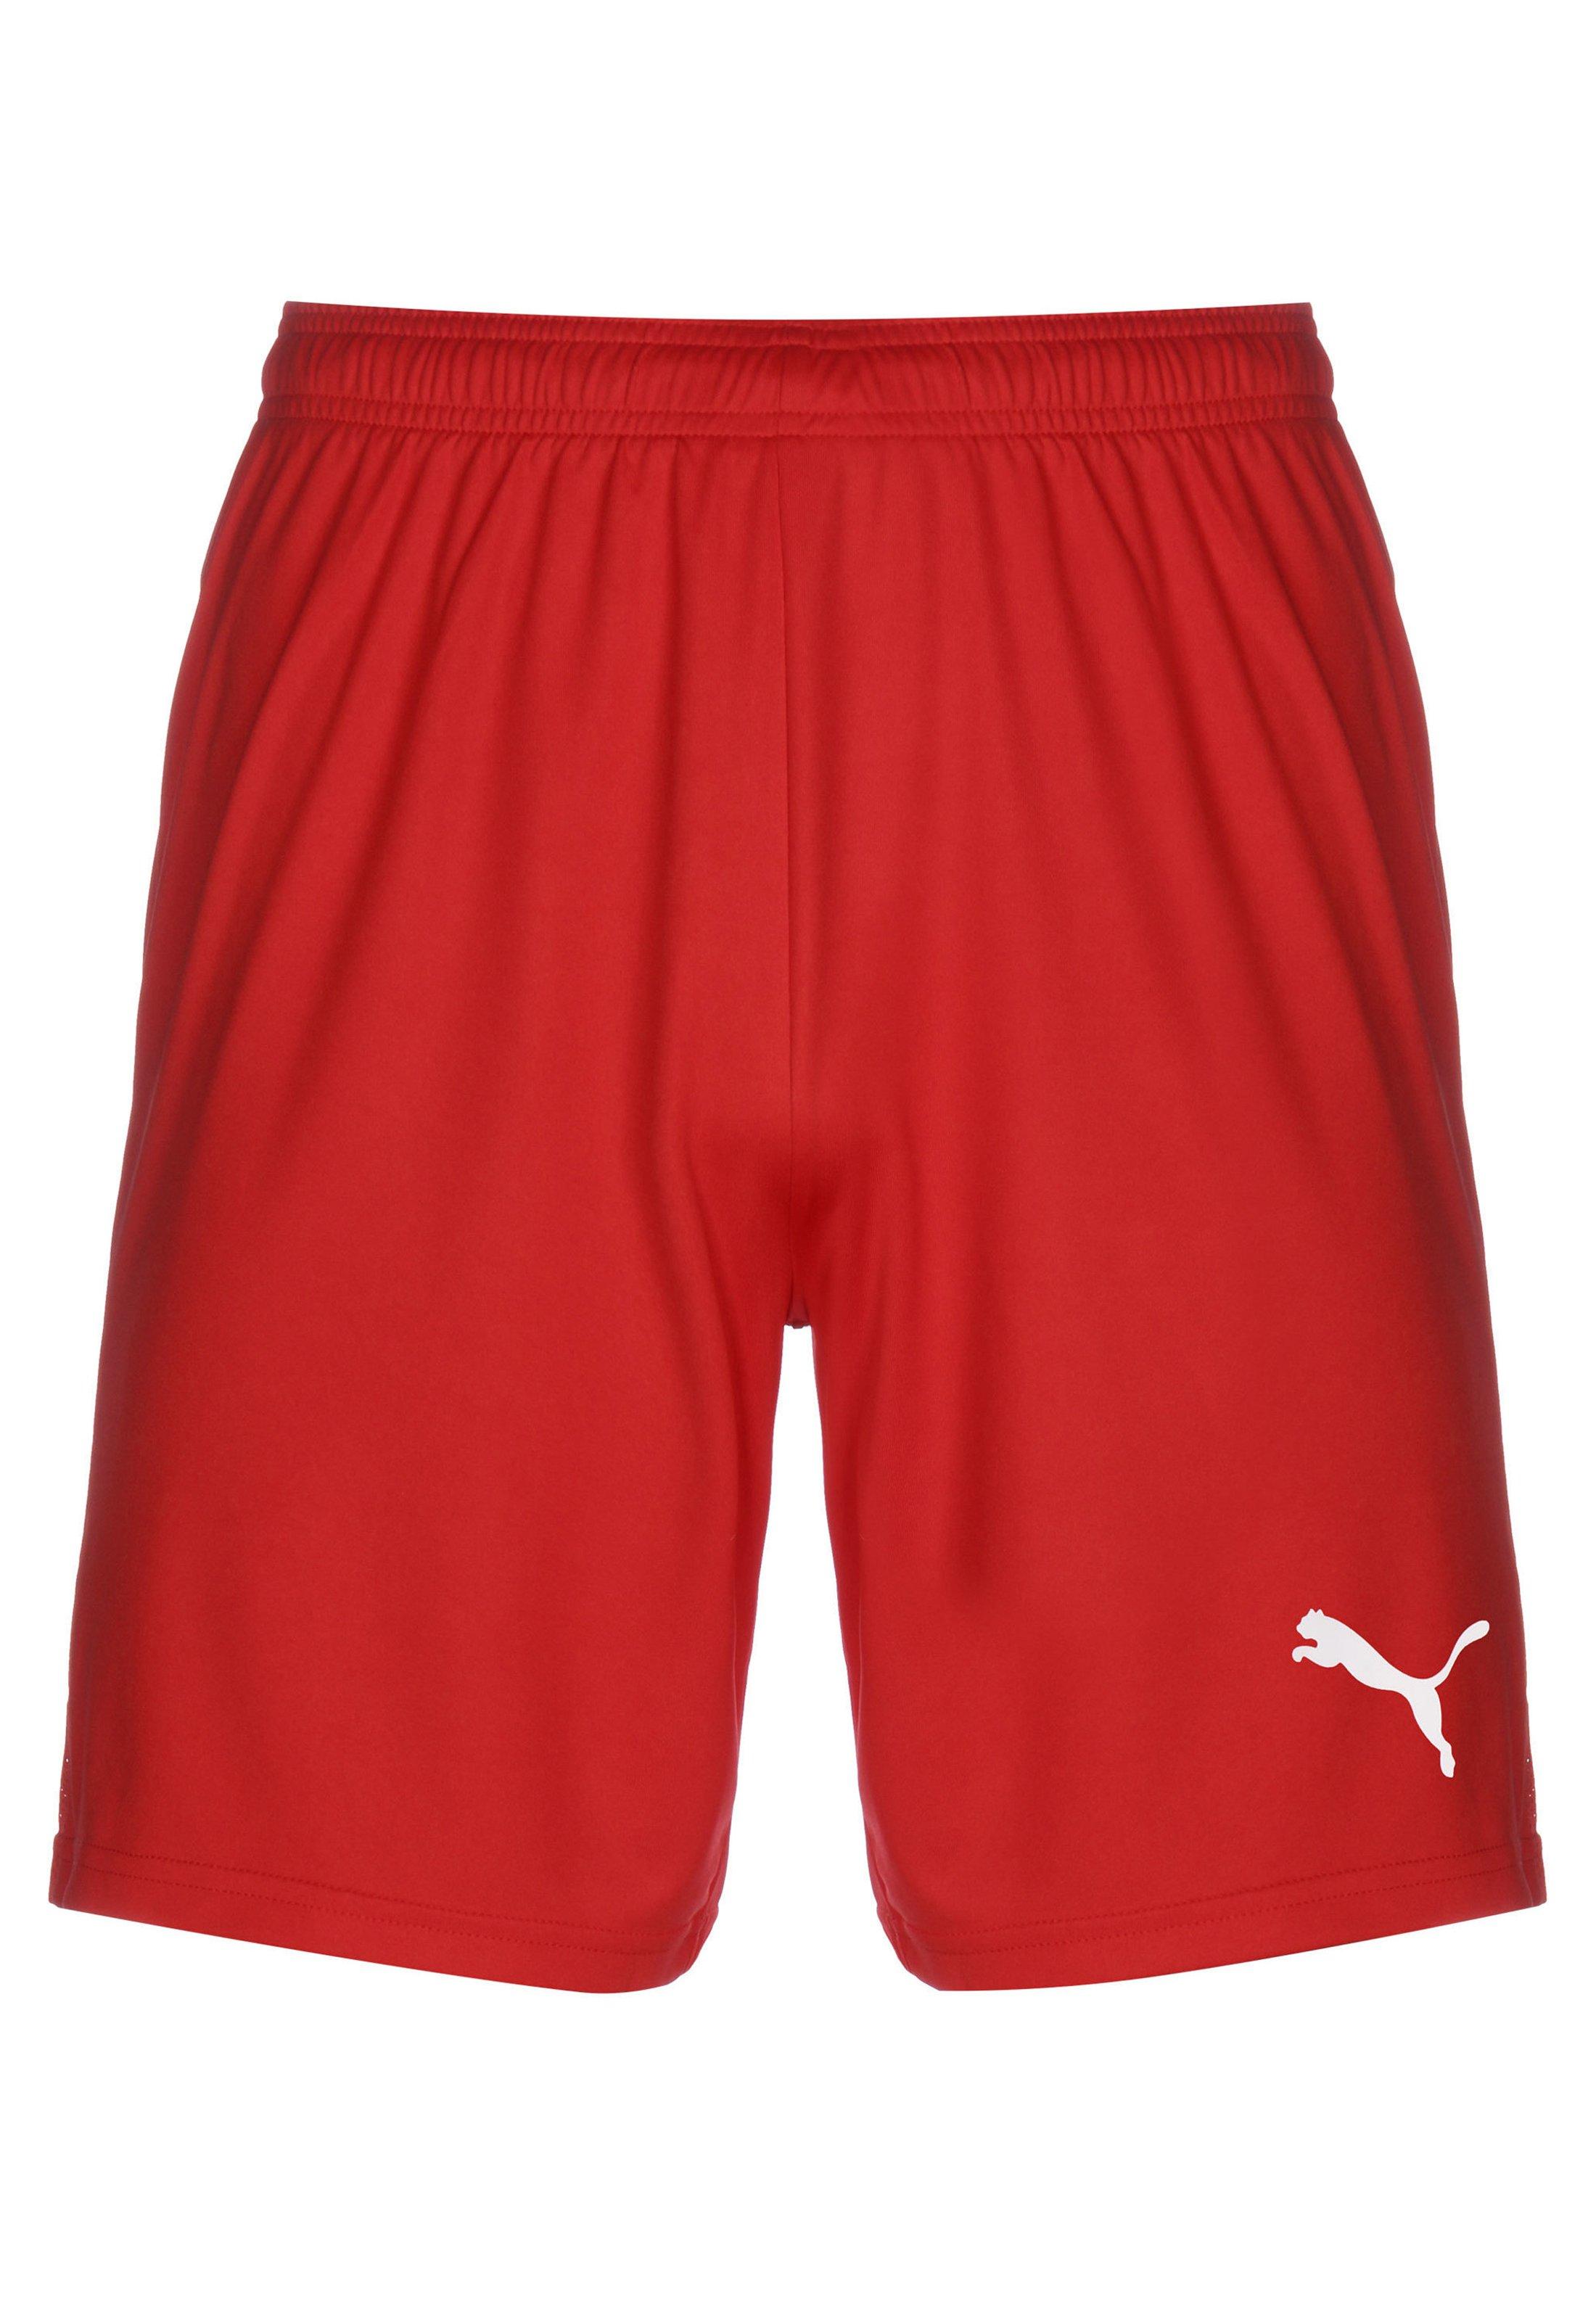 Herren TEAMGOAL SHORTS - kurze Sporthose